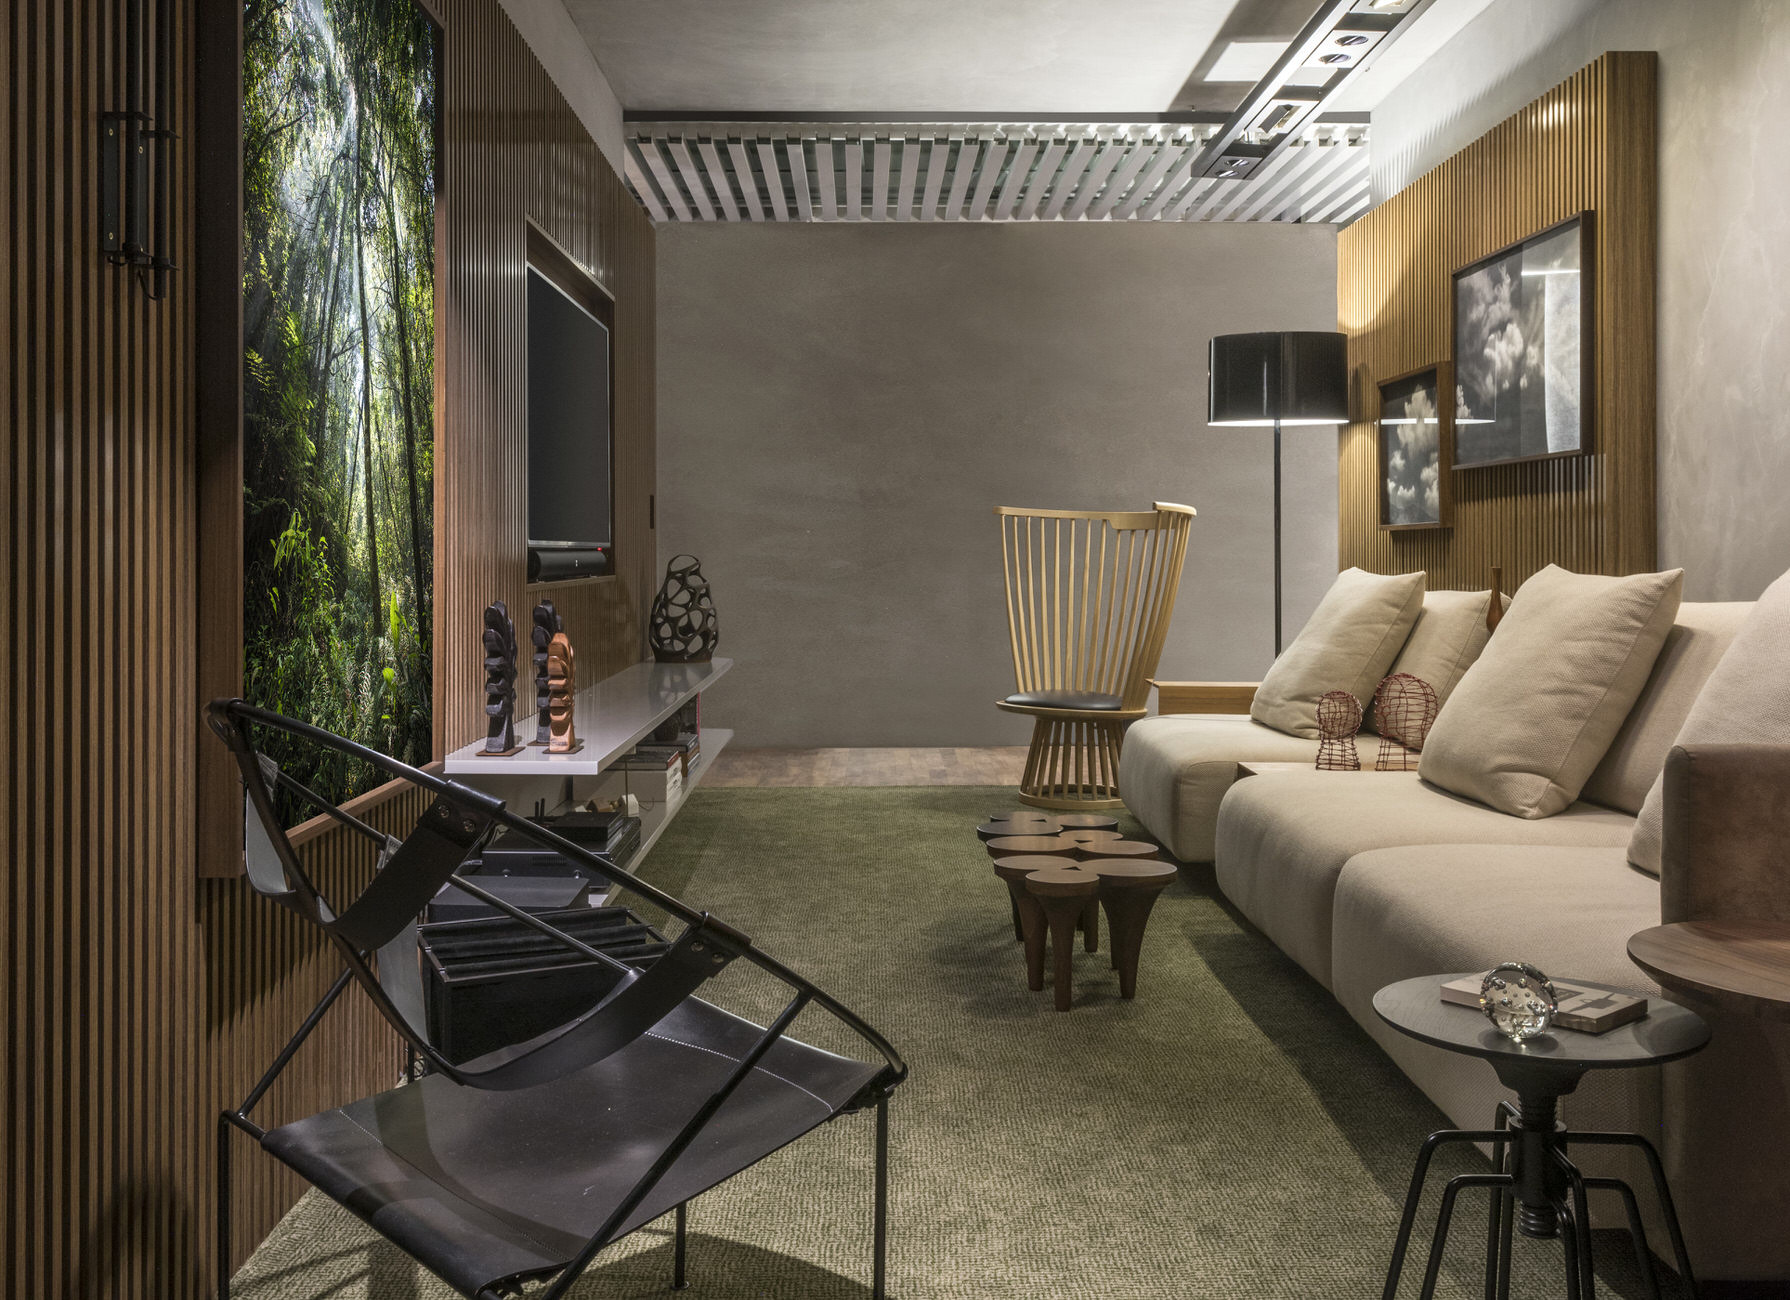 Situar-Projetos-CC2016d-Home